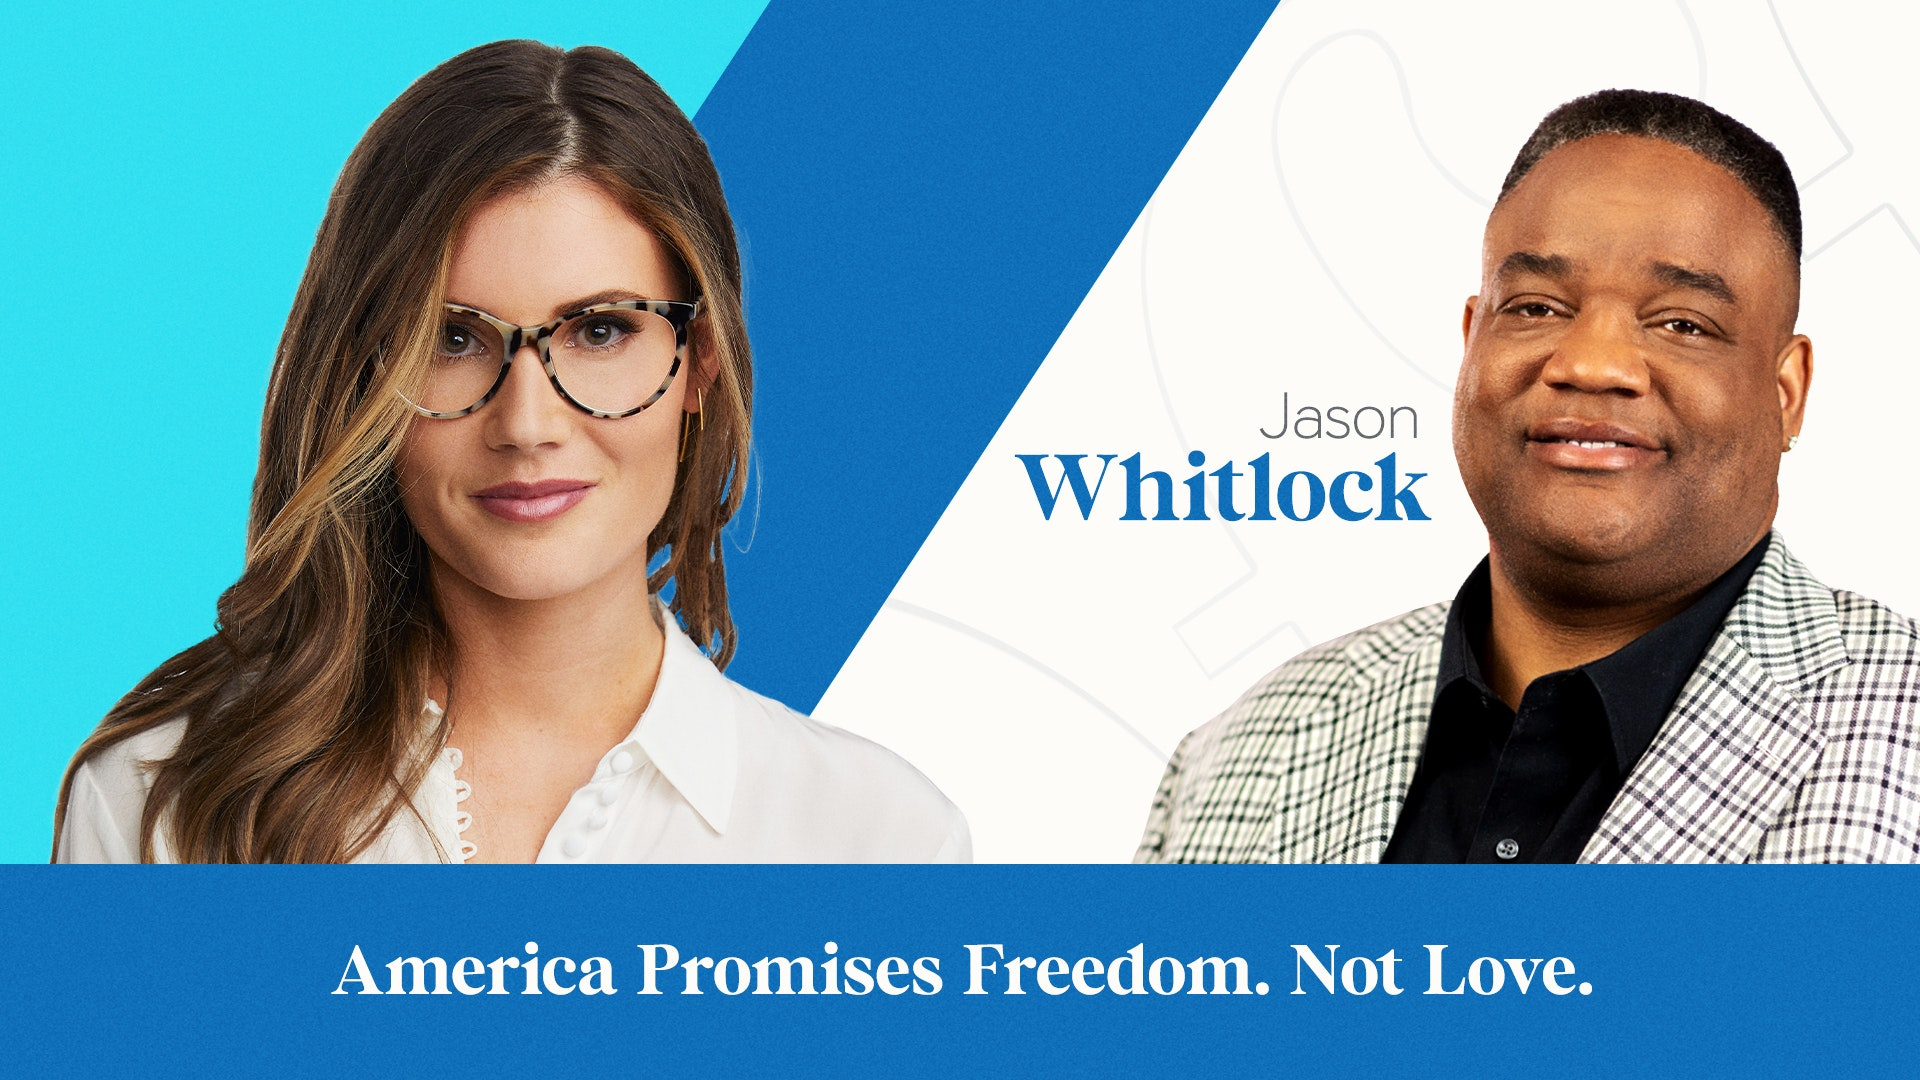 America Promises Freedom. Not Love.